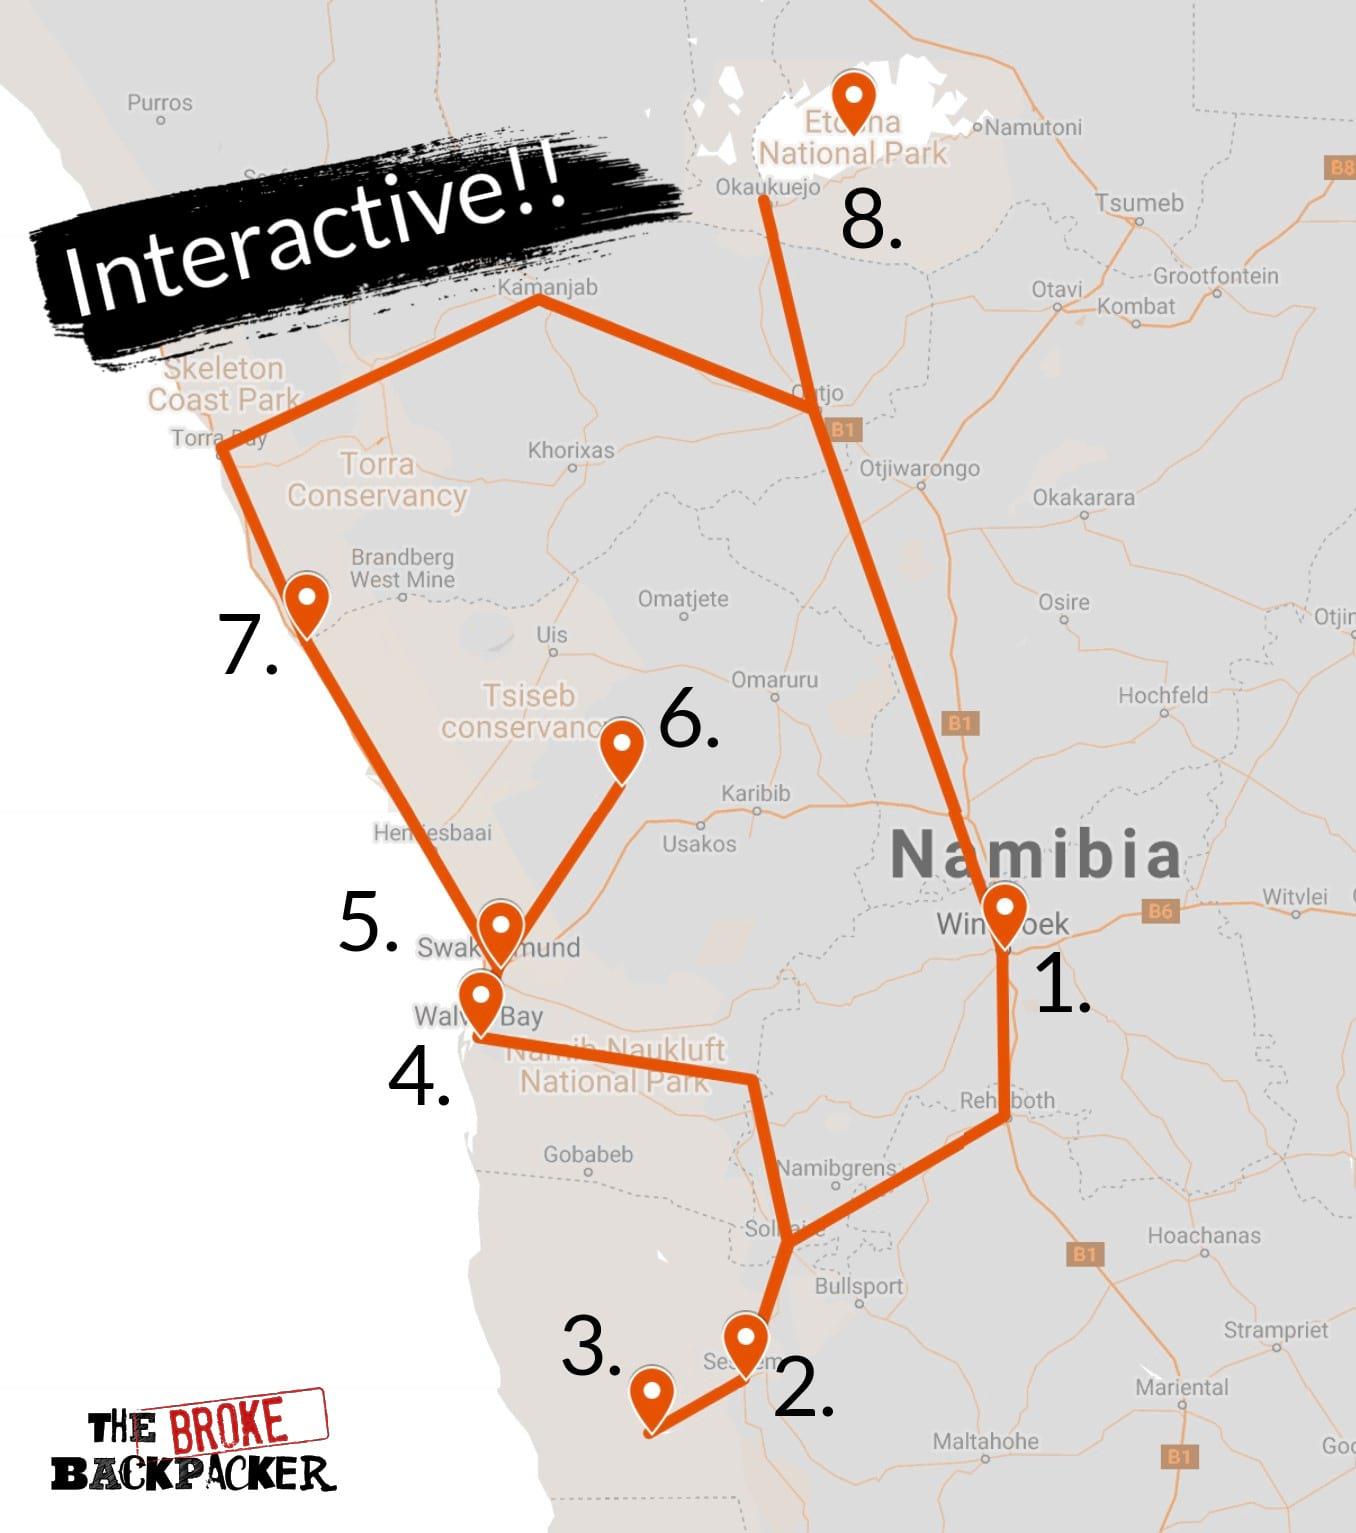 namibia backpacking itinerary map